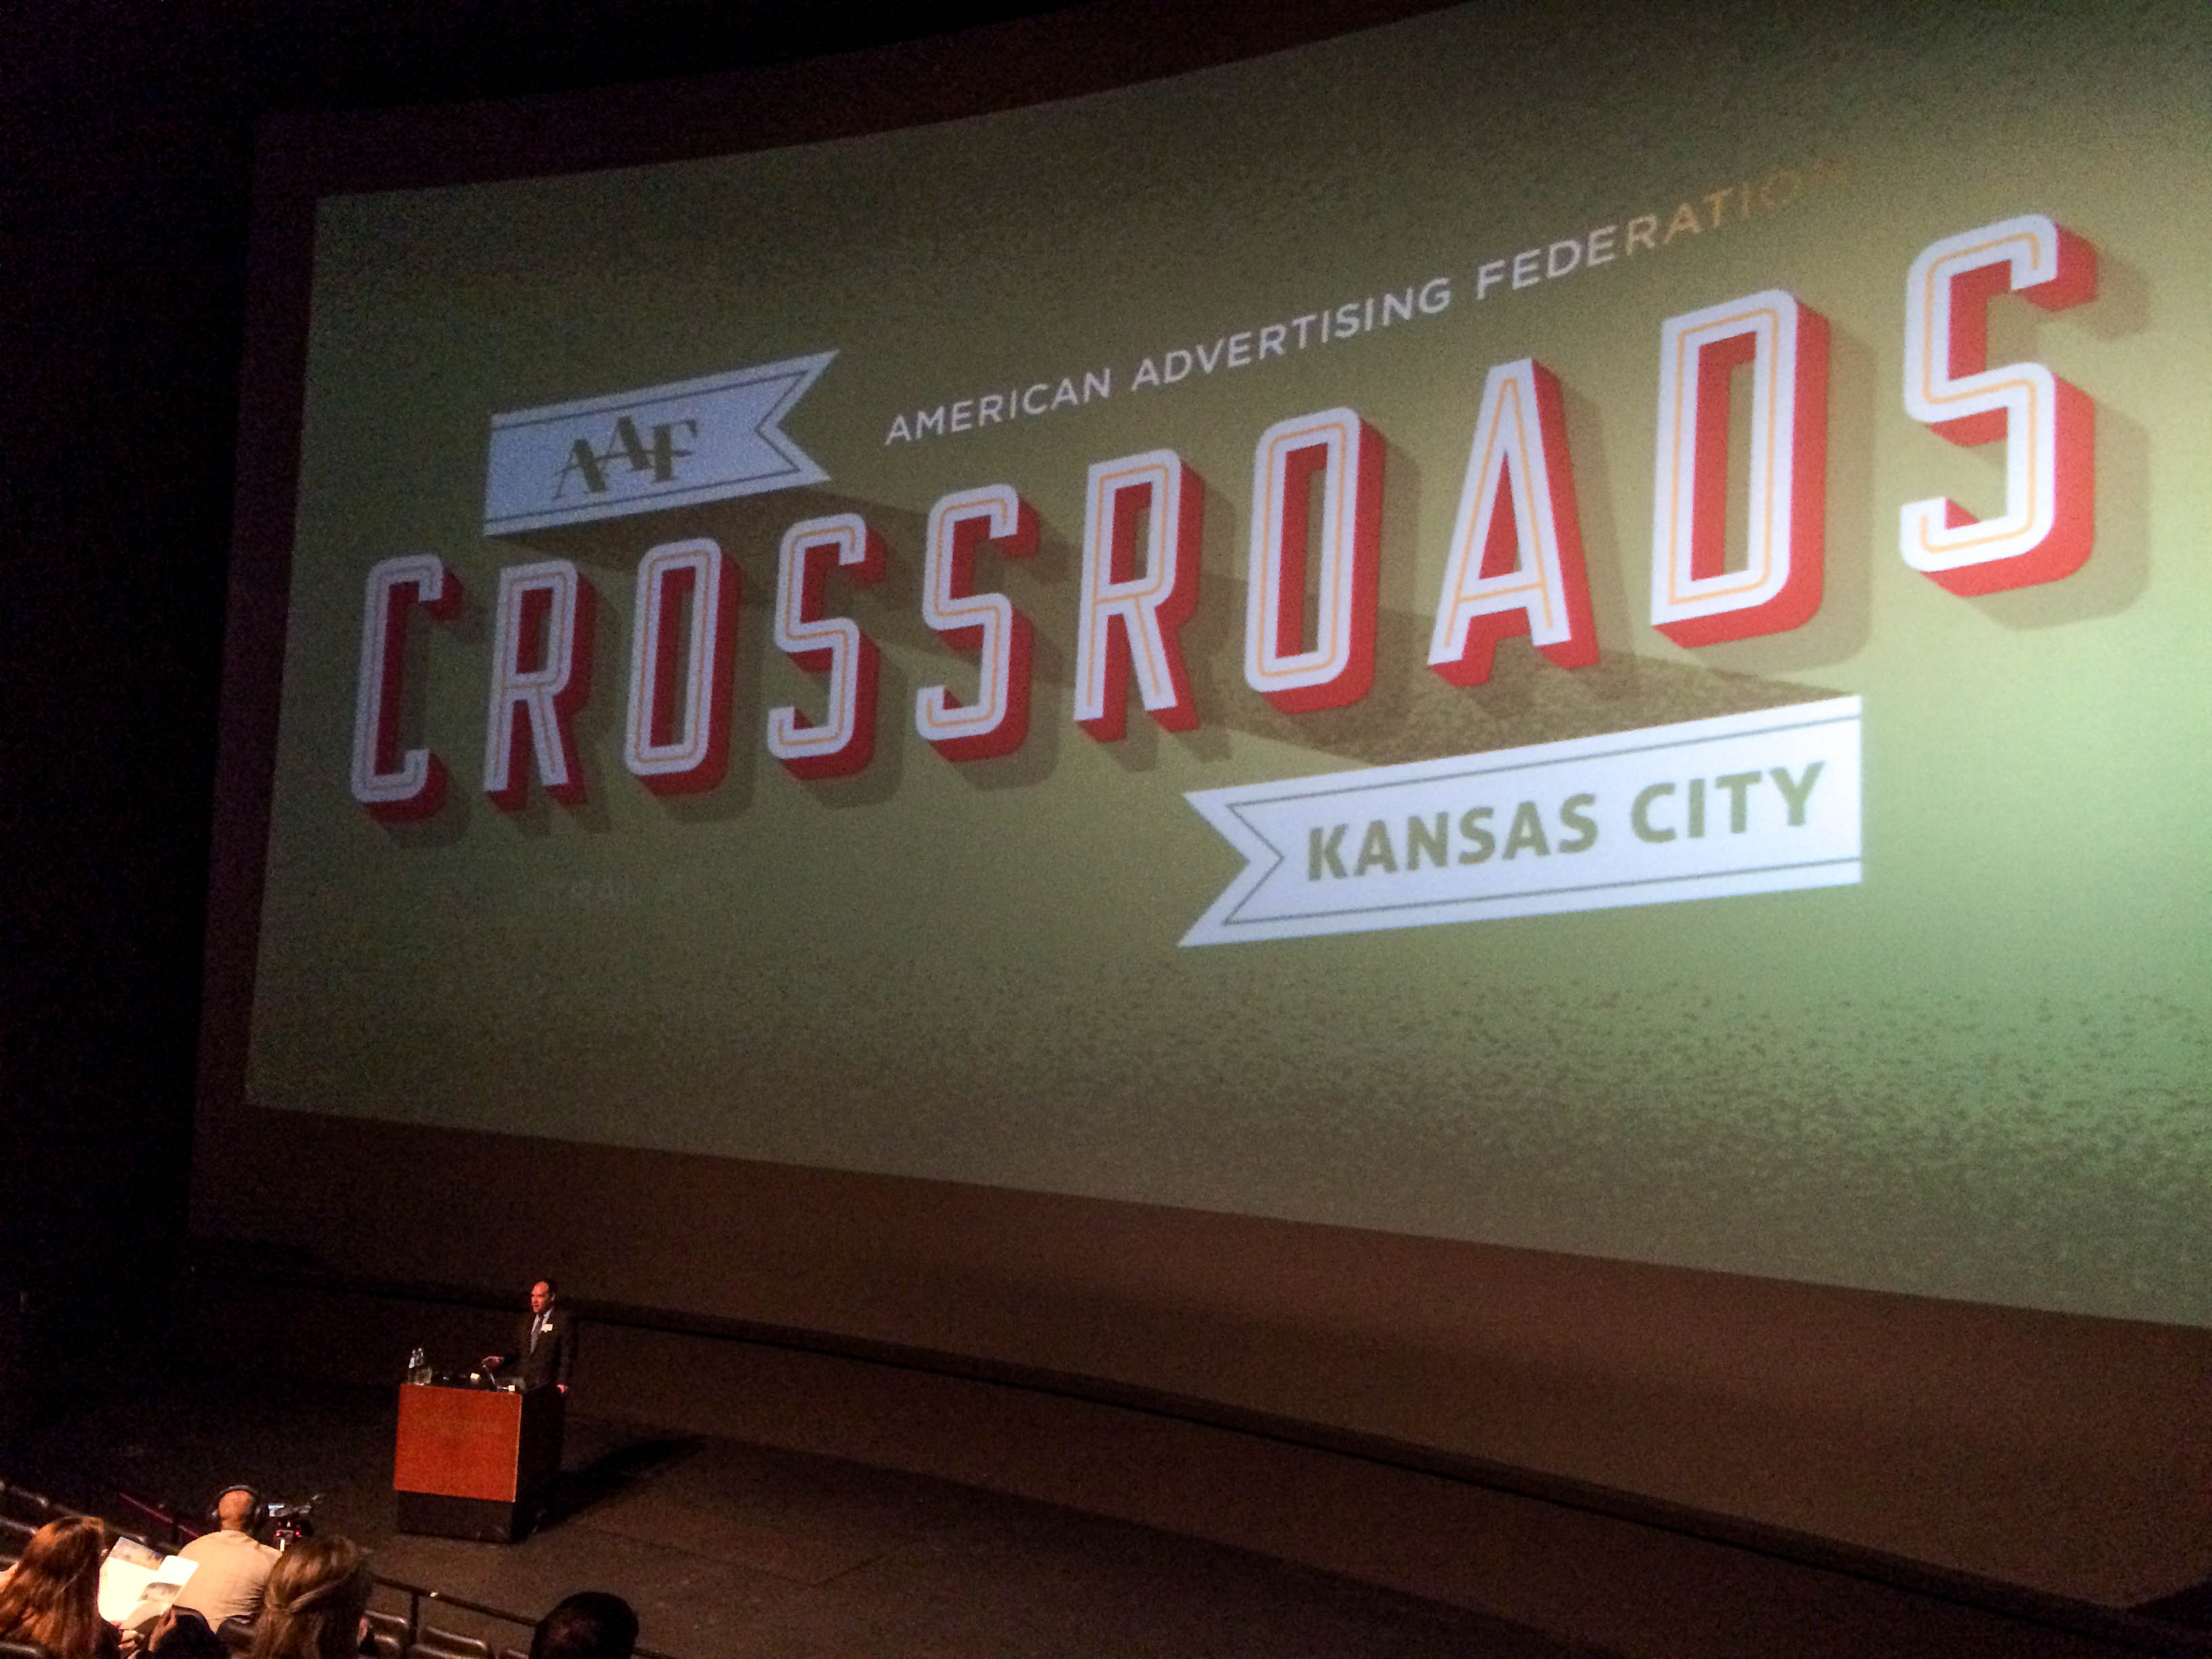 AAF Crossroads in Kansas City